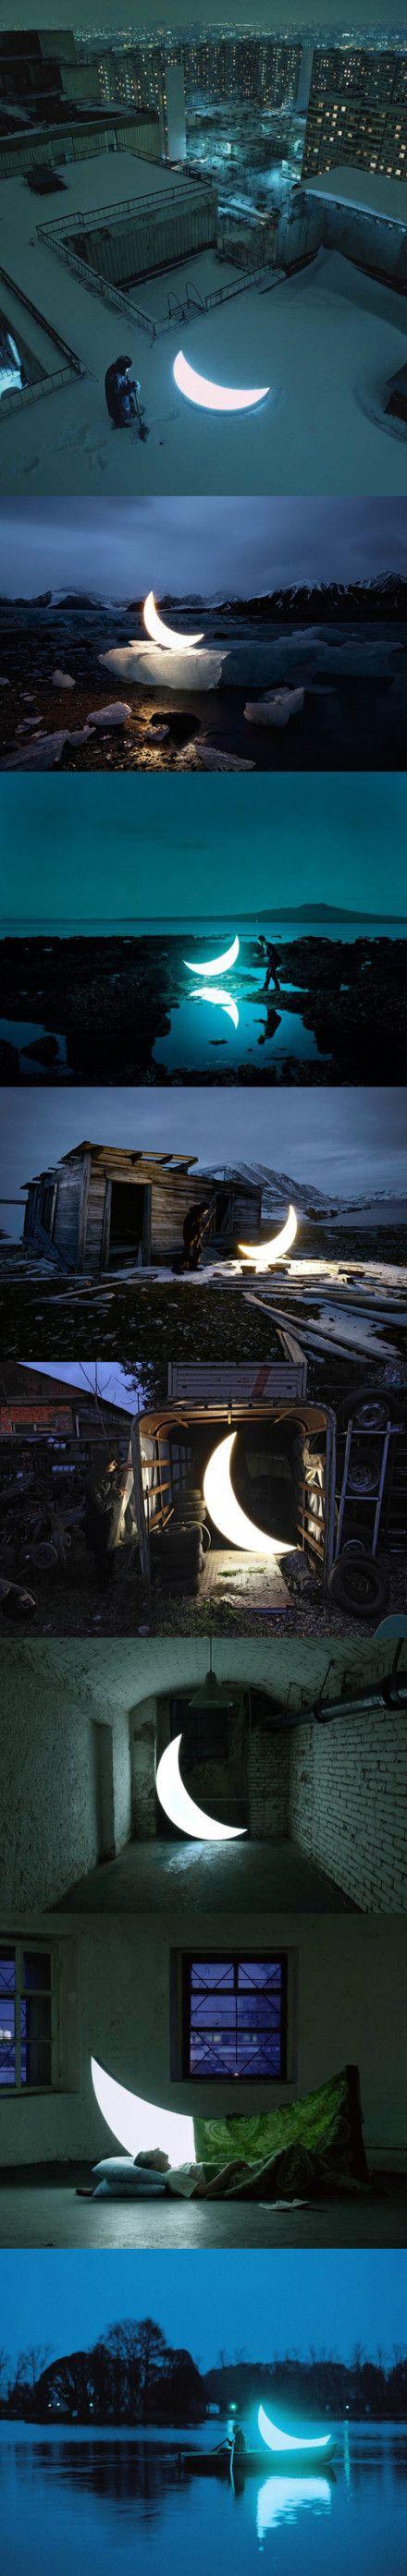 Leonid Tishkov created a moon.